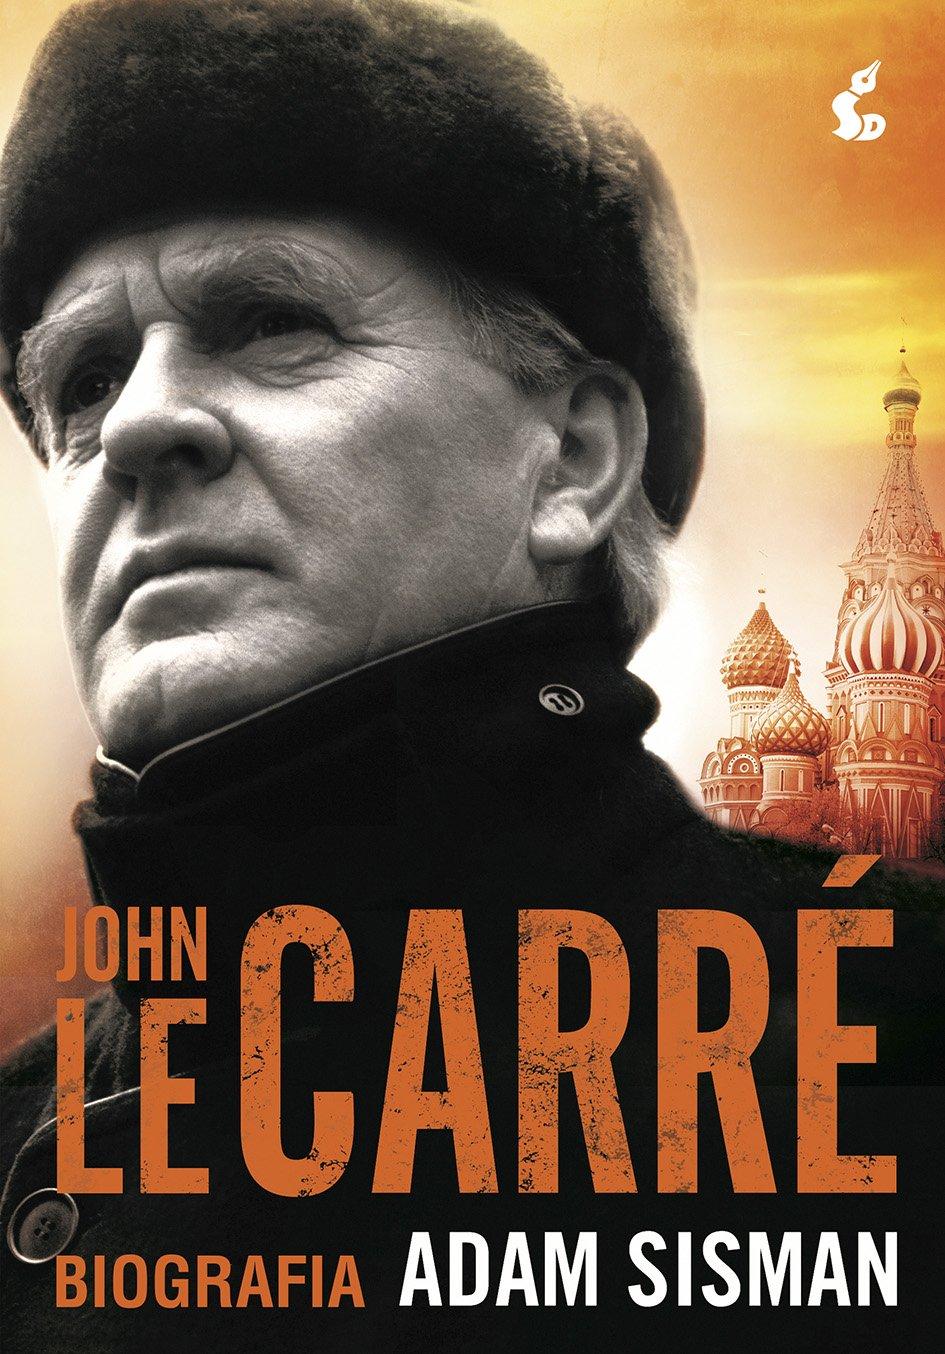 John le Carré. Biografia - Ebook (Książka EPUB) do pobrania w formacie EPUB